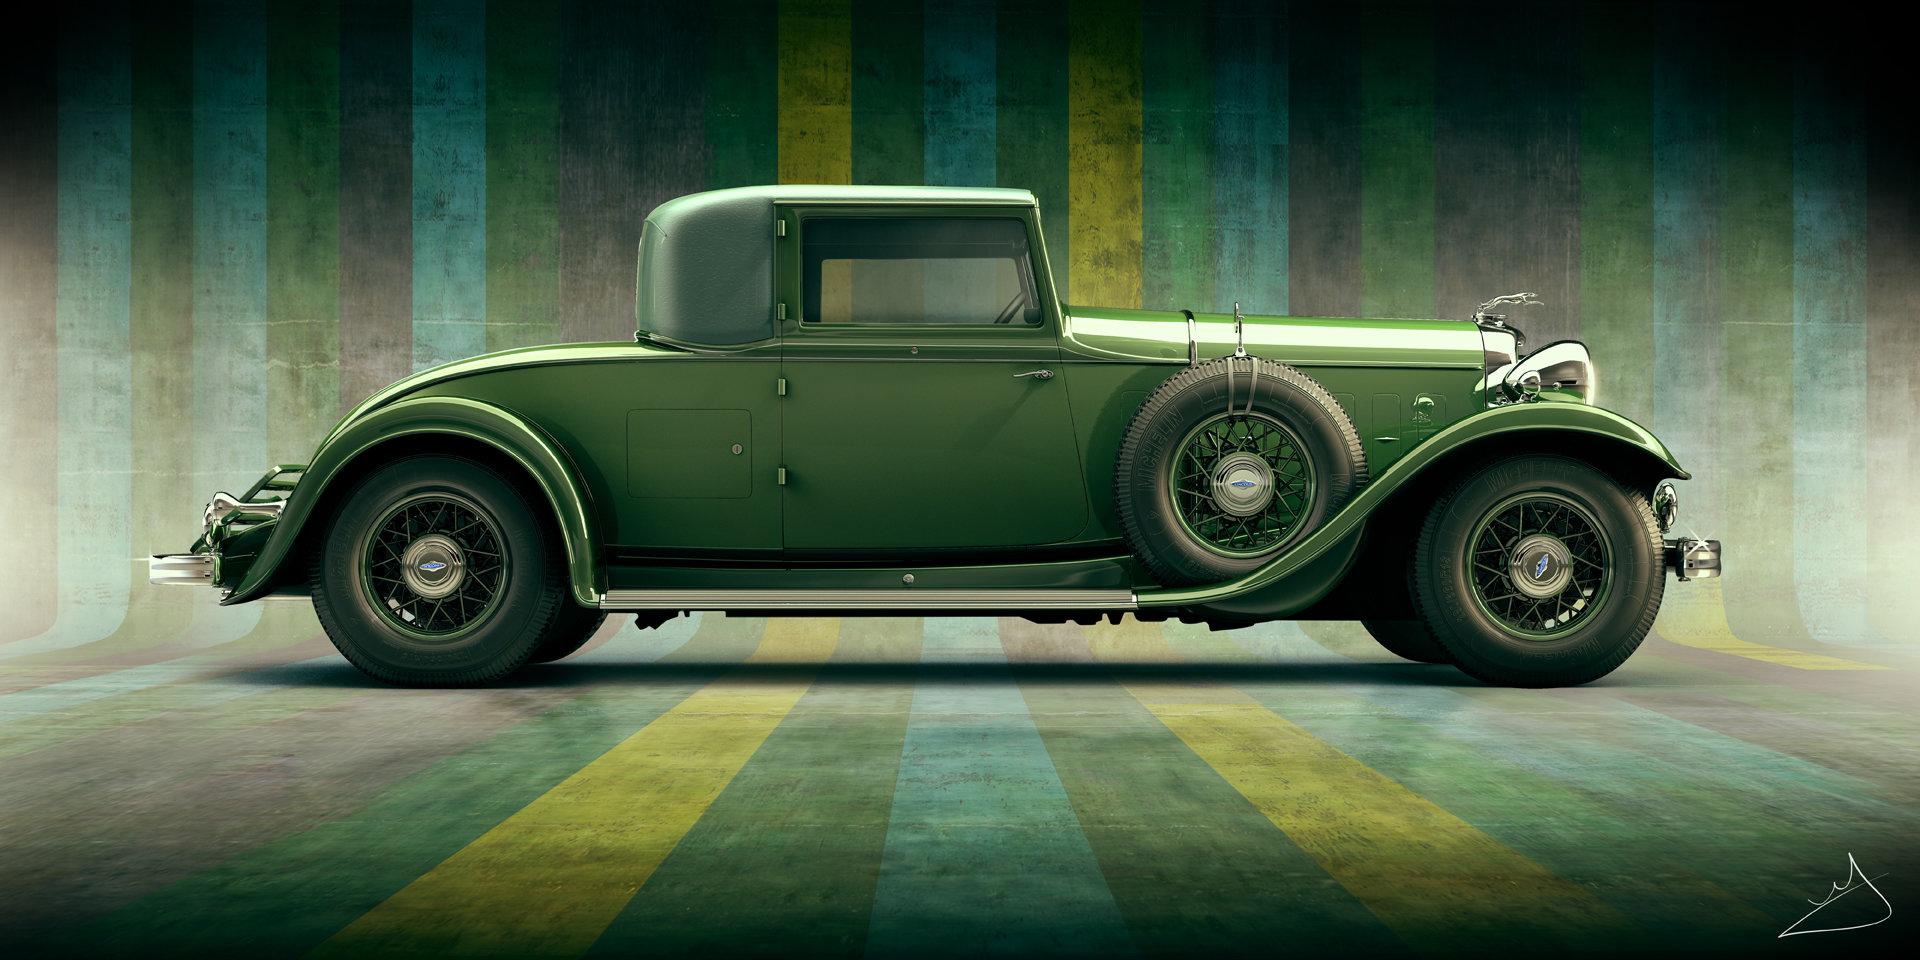 Alexandr novitskiy 1932 lincoln kb coupe art